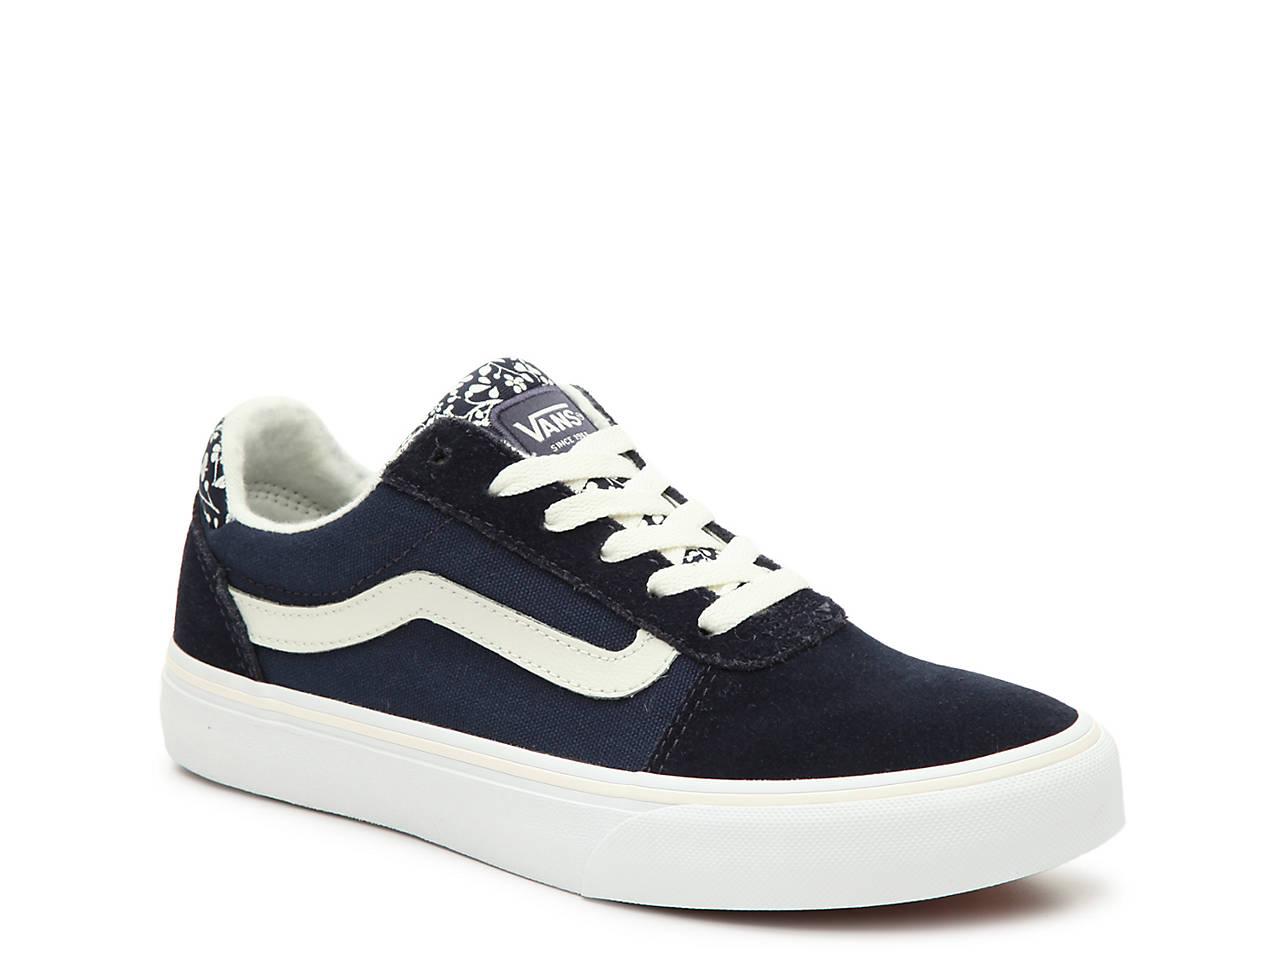 b954defb7 Vans Ward Deluxe Sneaker - Women's Women's Shoes | DSW